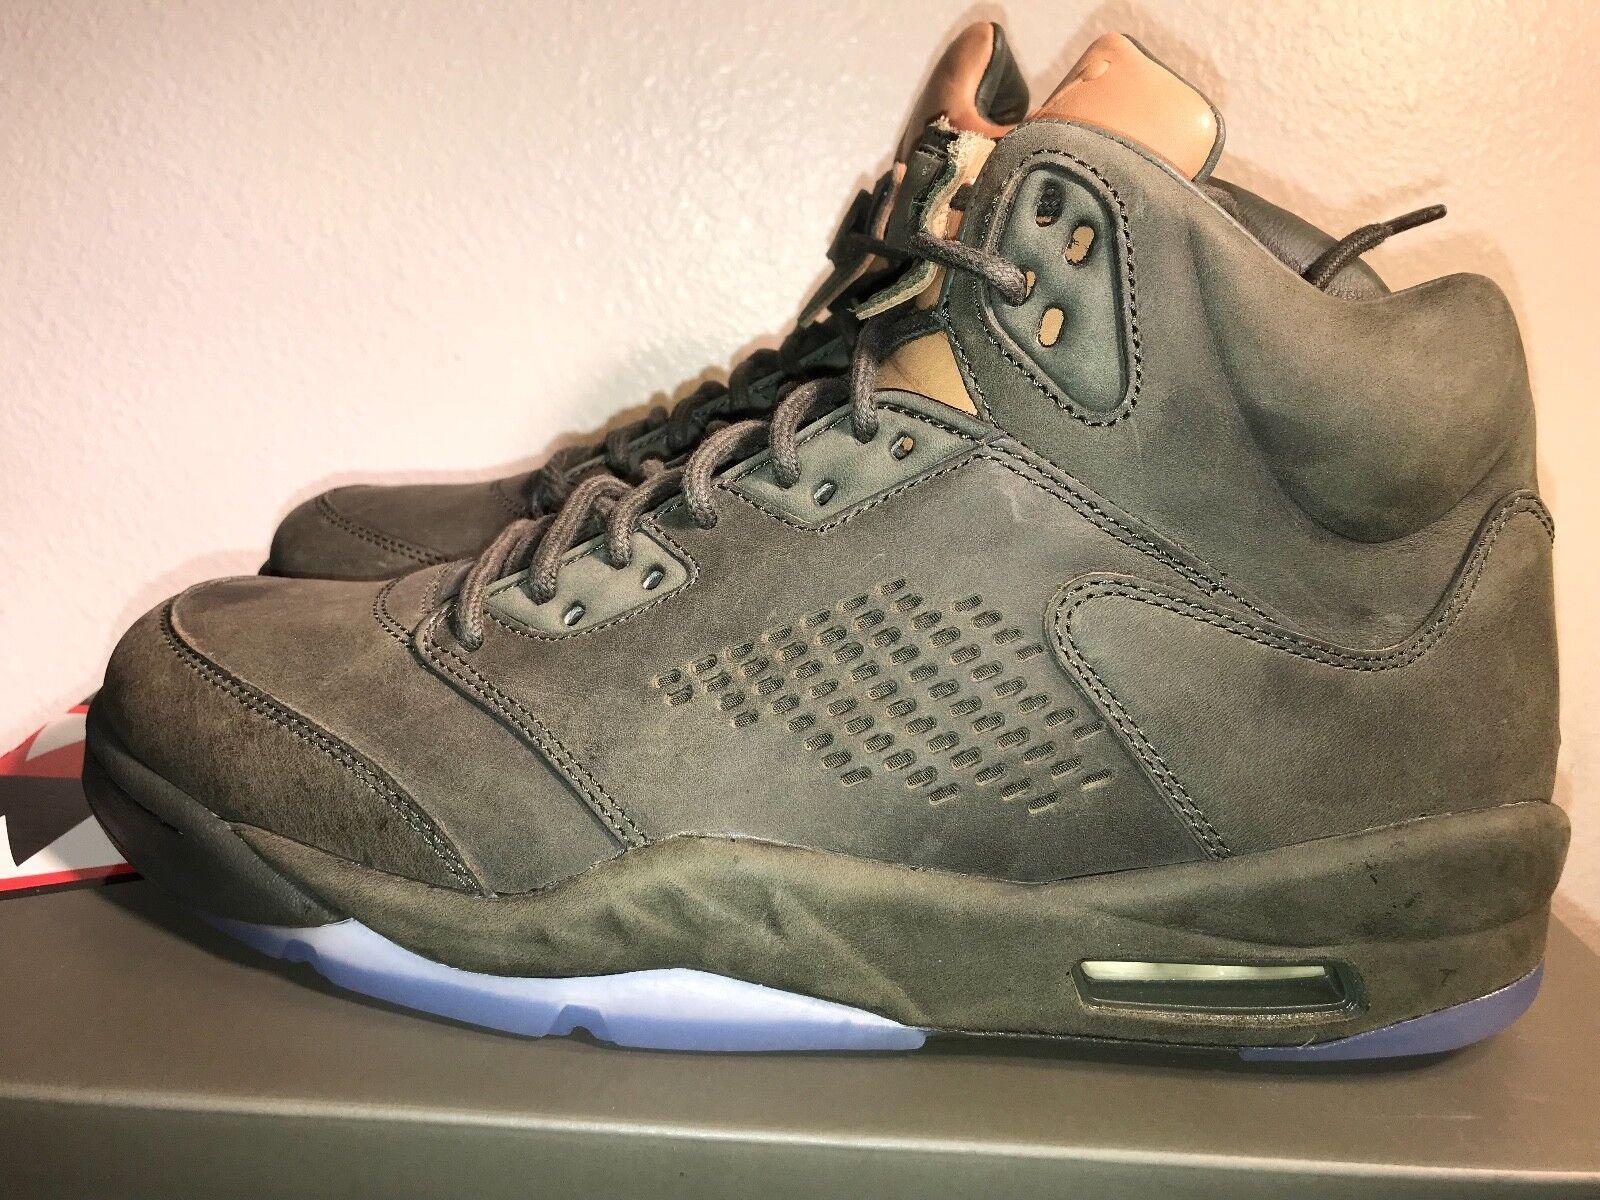 Nike Air Jordan 5 Retro Prem 881432-305 Size 10.5 Sequoia olive DS Authentic